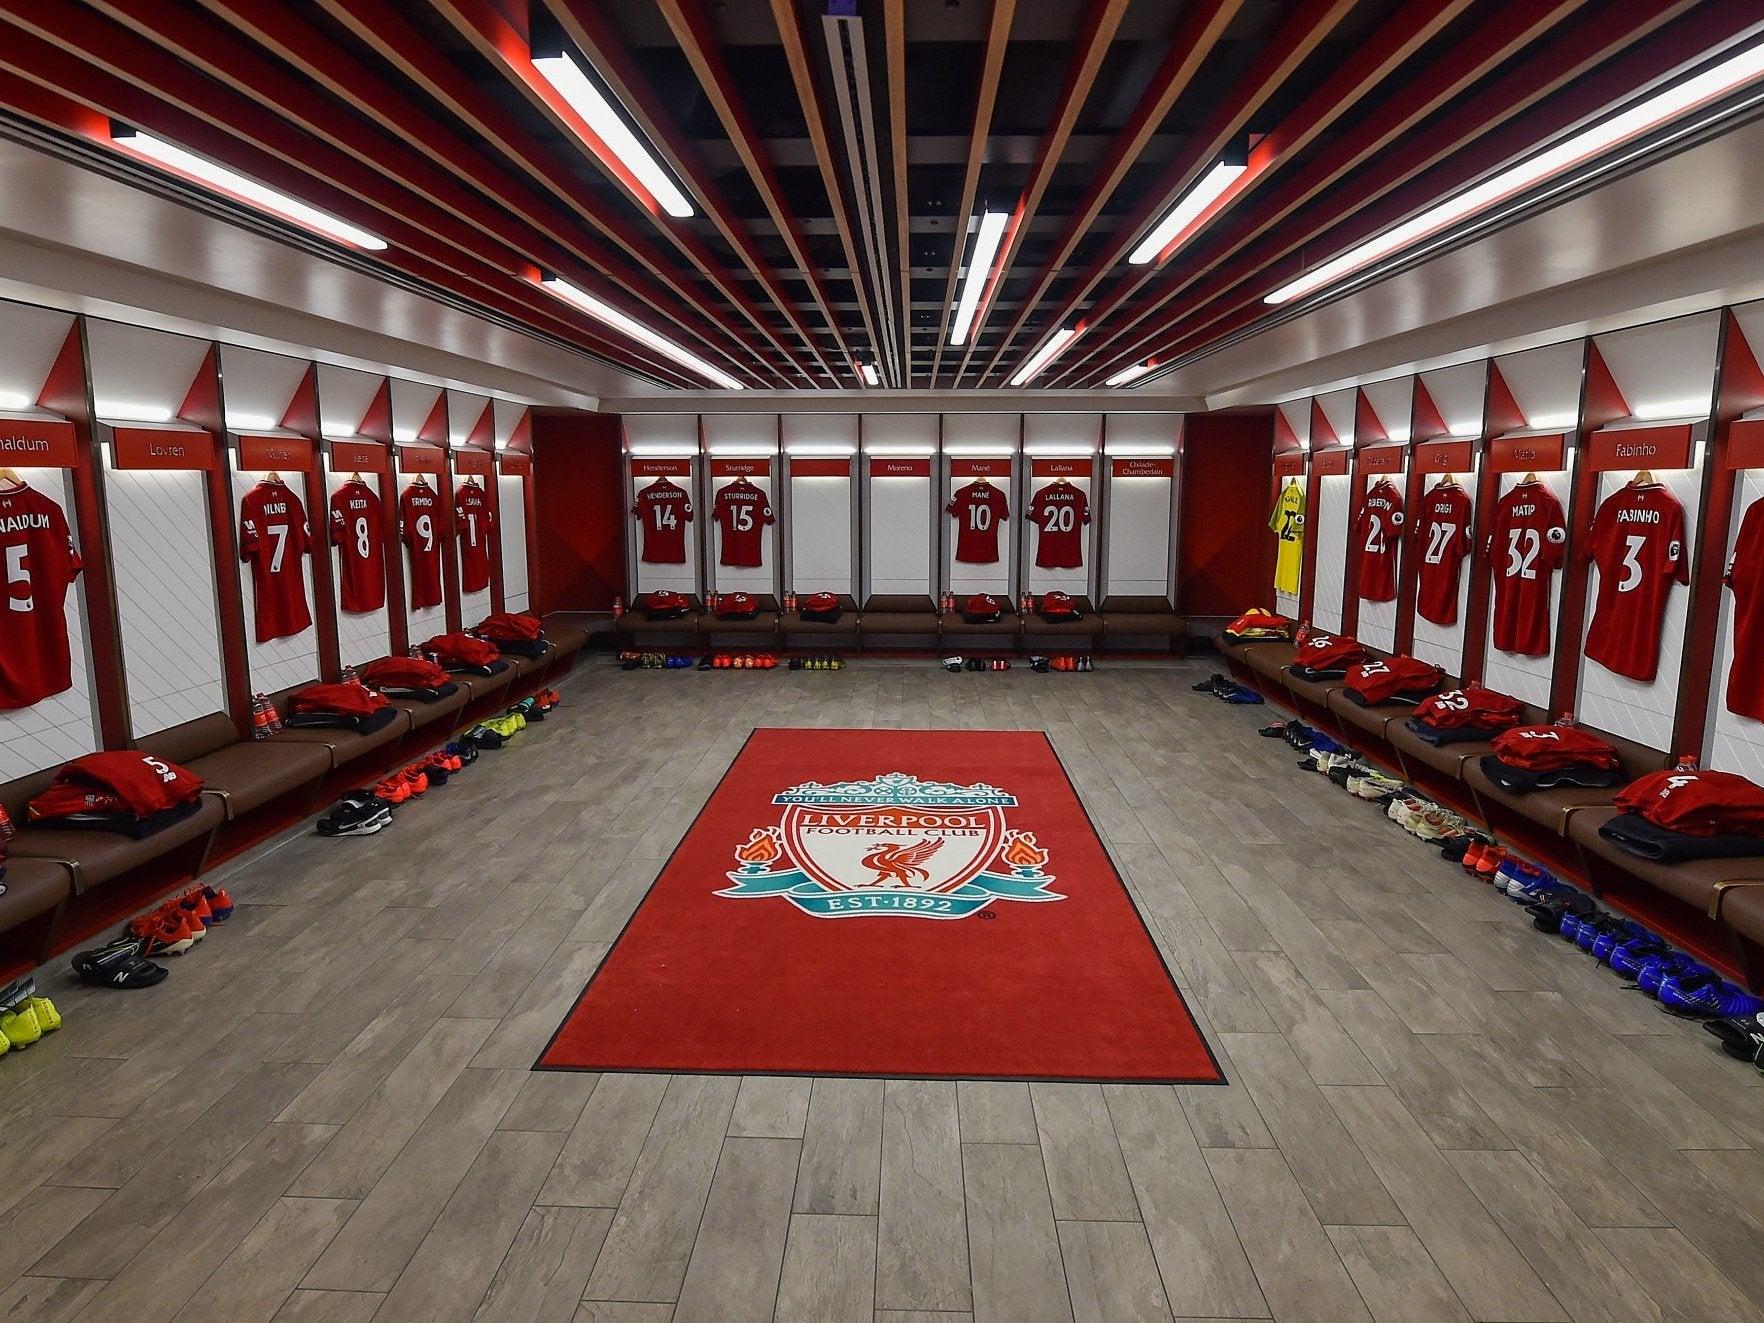 Liverpool Vs Bournemouth: Liverpool Vs Bournemouth LIVE